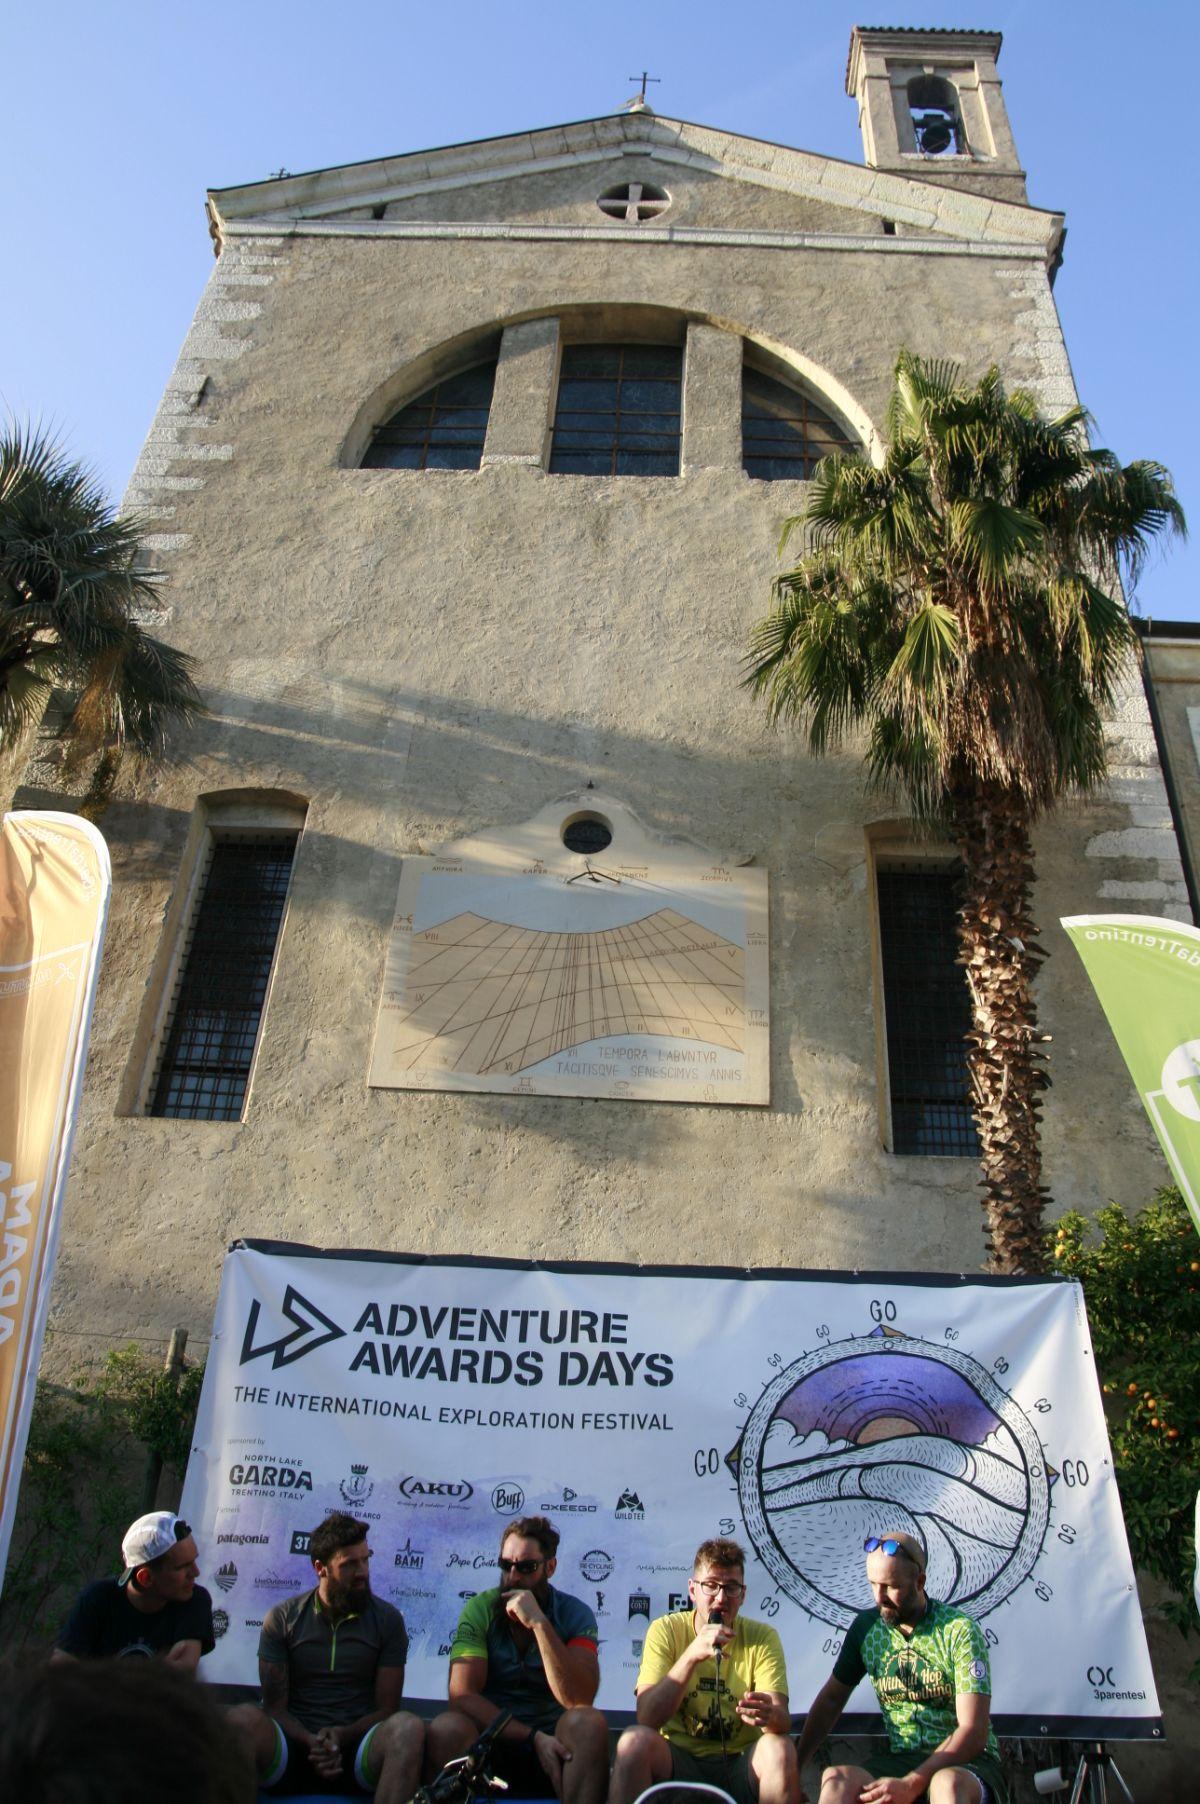 Arco Adventure Awards